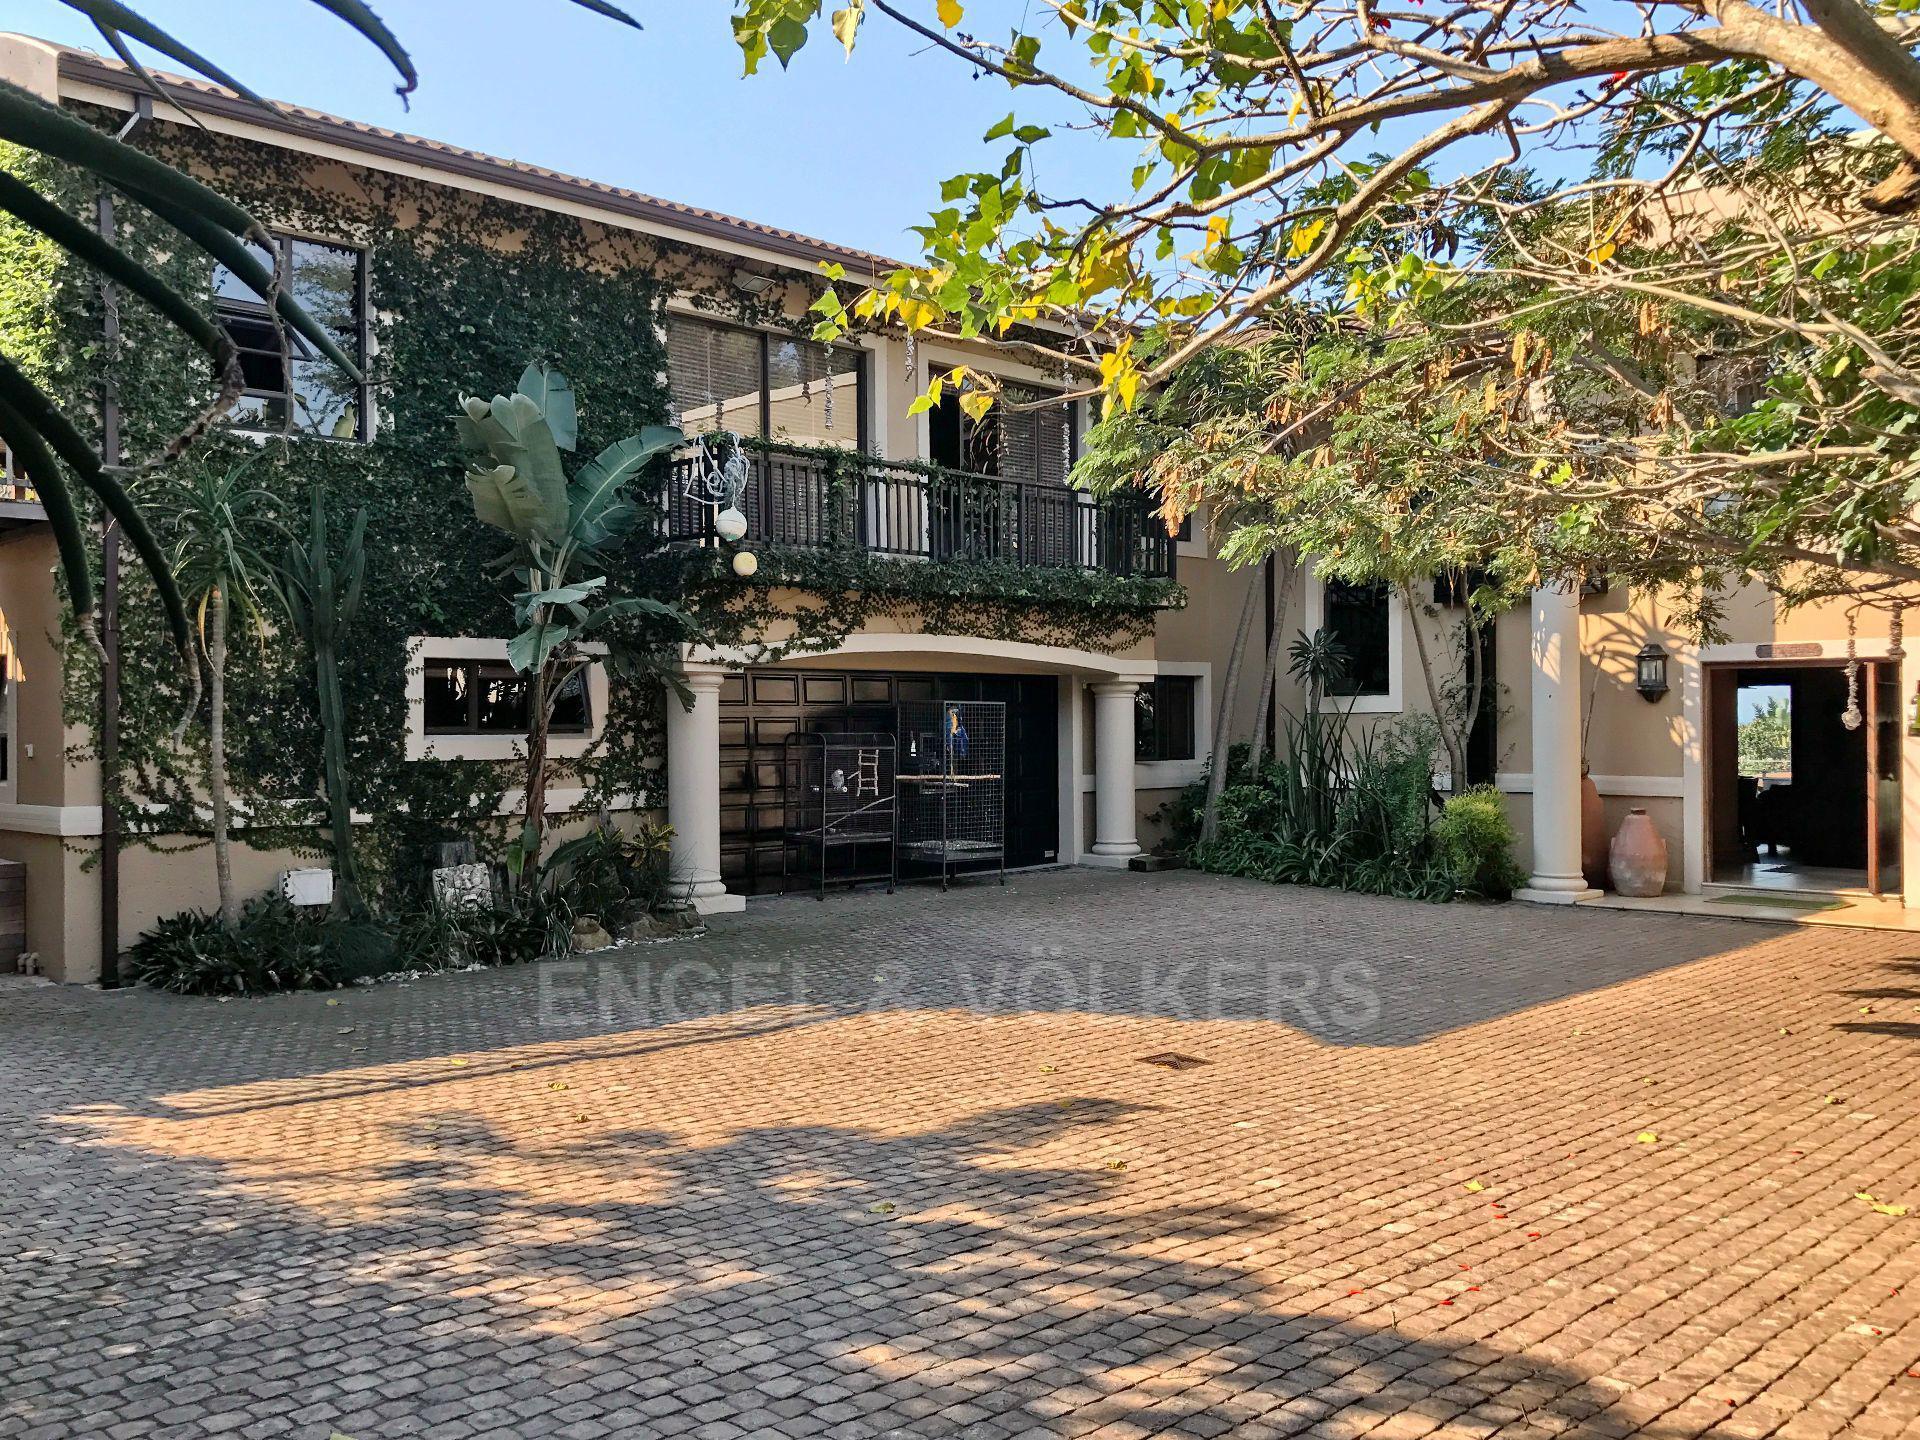 Umdloti, Umdloti Property  | Houses For Sale Umdloti, UMDLOTI, Duplex 5 bedrooms property for sale Price:9,800,000